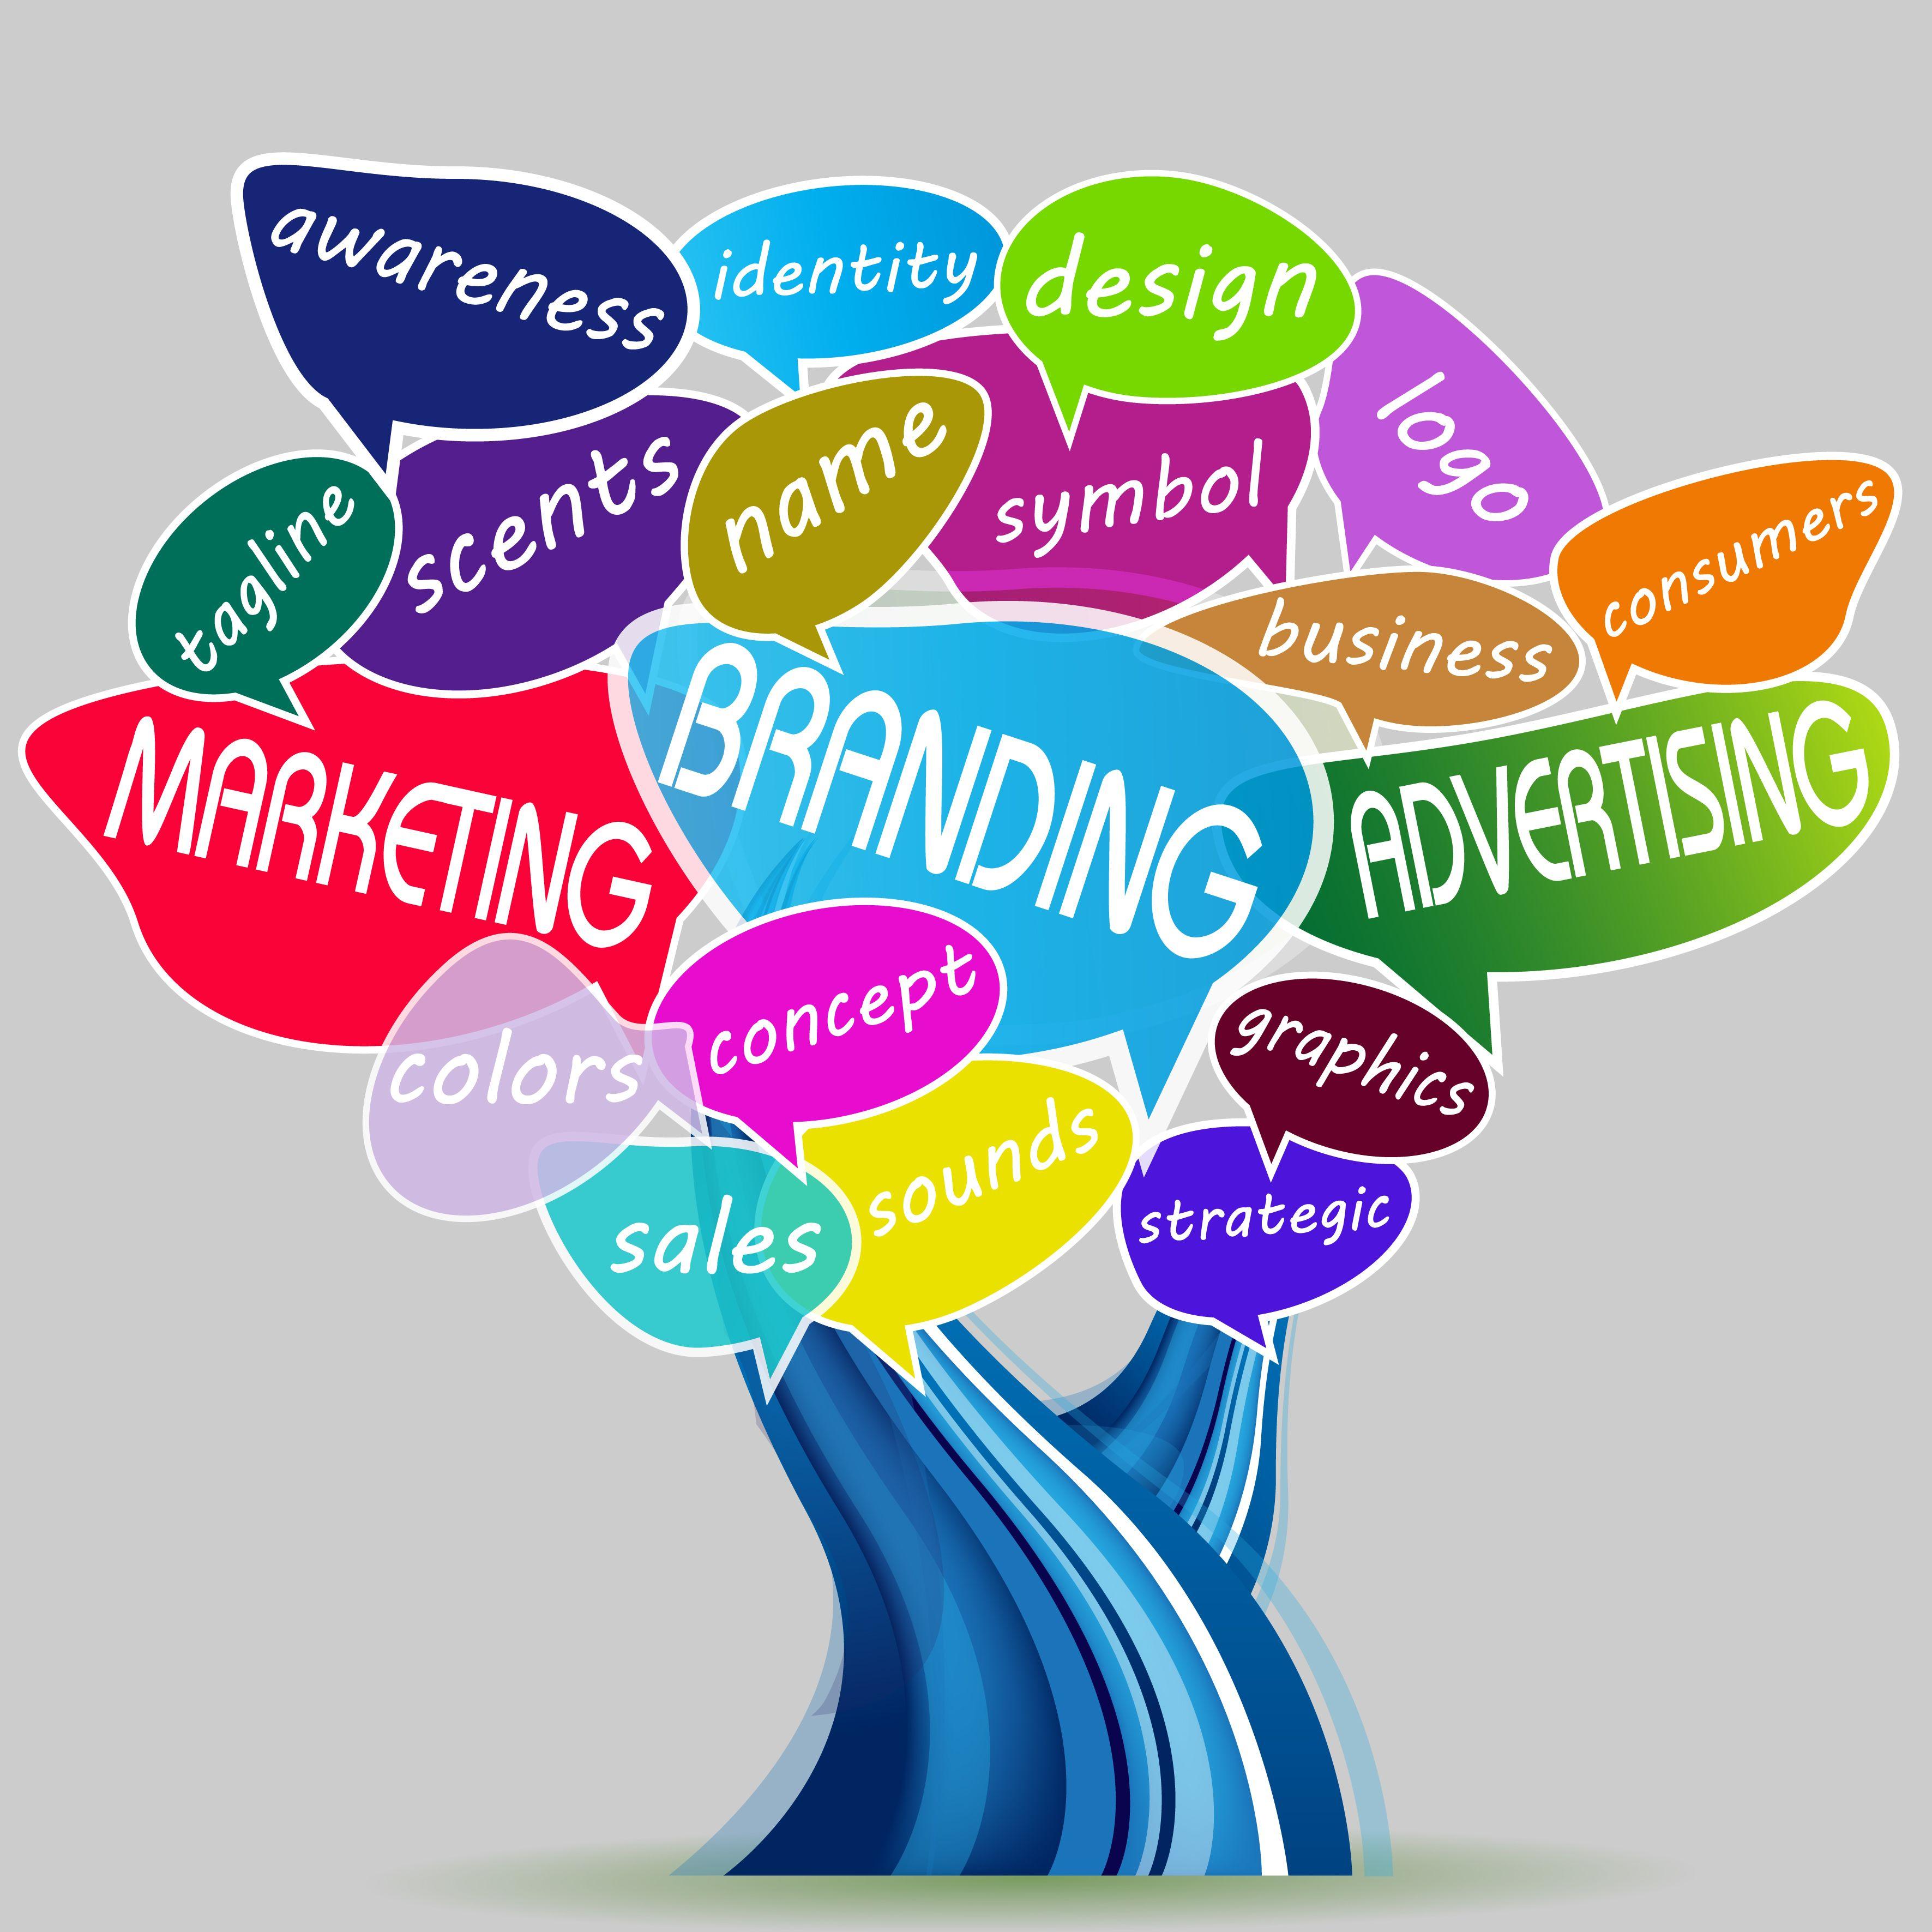 Branding is the marketing practice of creating a name symbol or branding is the marketing practice of creating a name symbol or design that identifies and buycottarizona Gallery